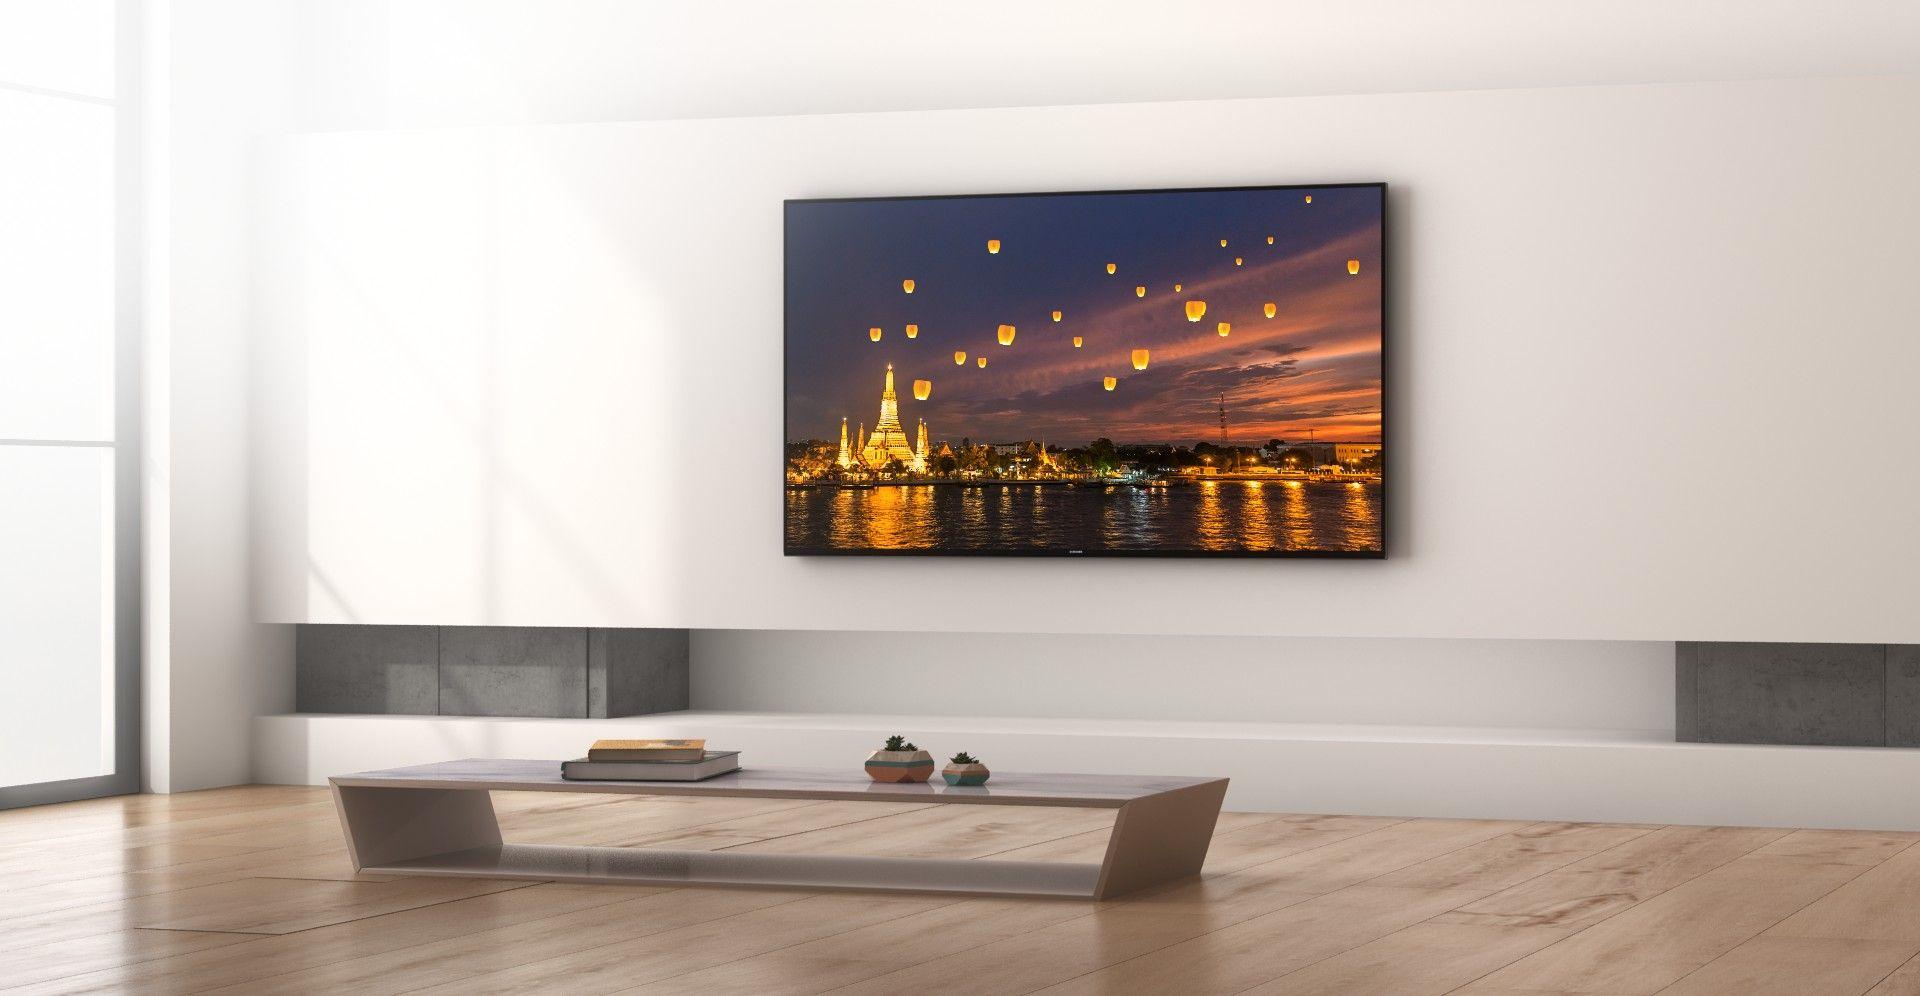 55 Inch Hu7500 3d 1000 Cmr Uhd 4k Led Tv Samsung Uk Wall Mounted Tv Samsung Tv Mount 75 Inch Tvs